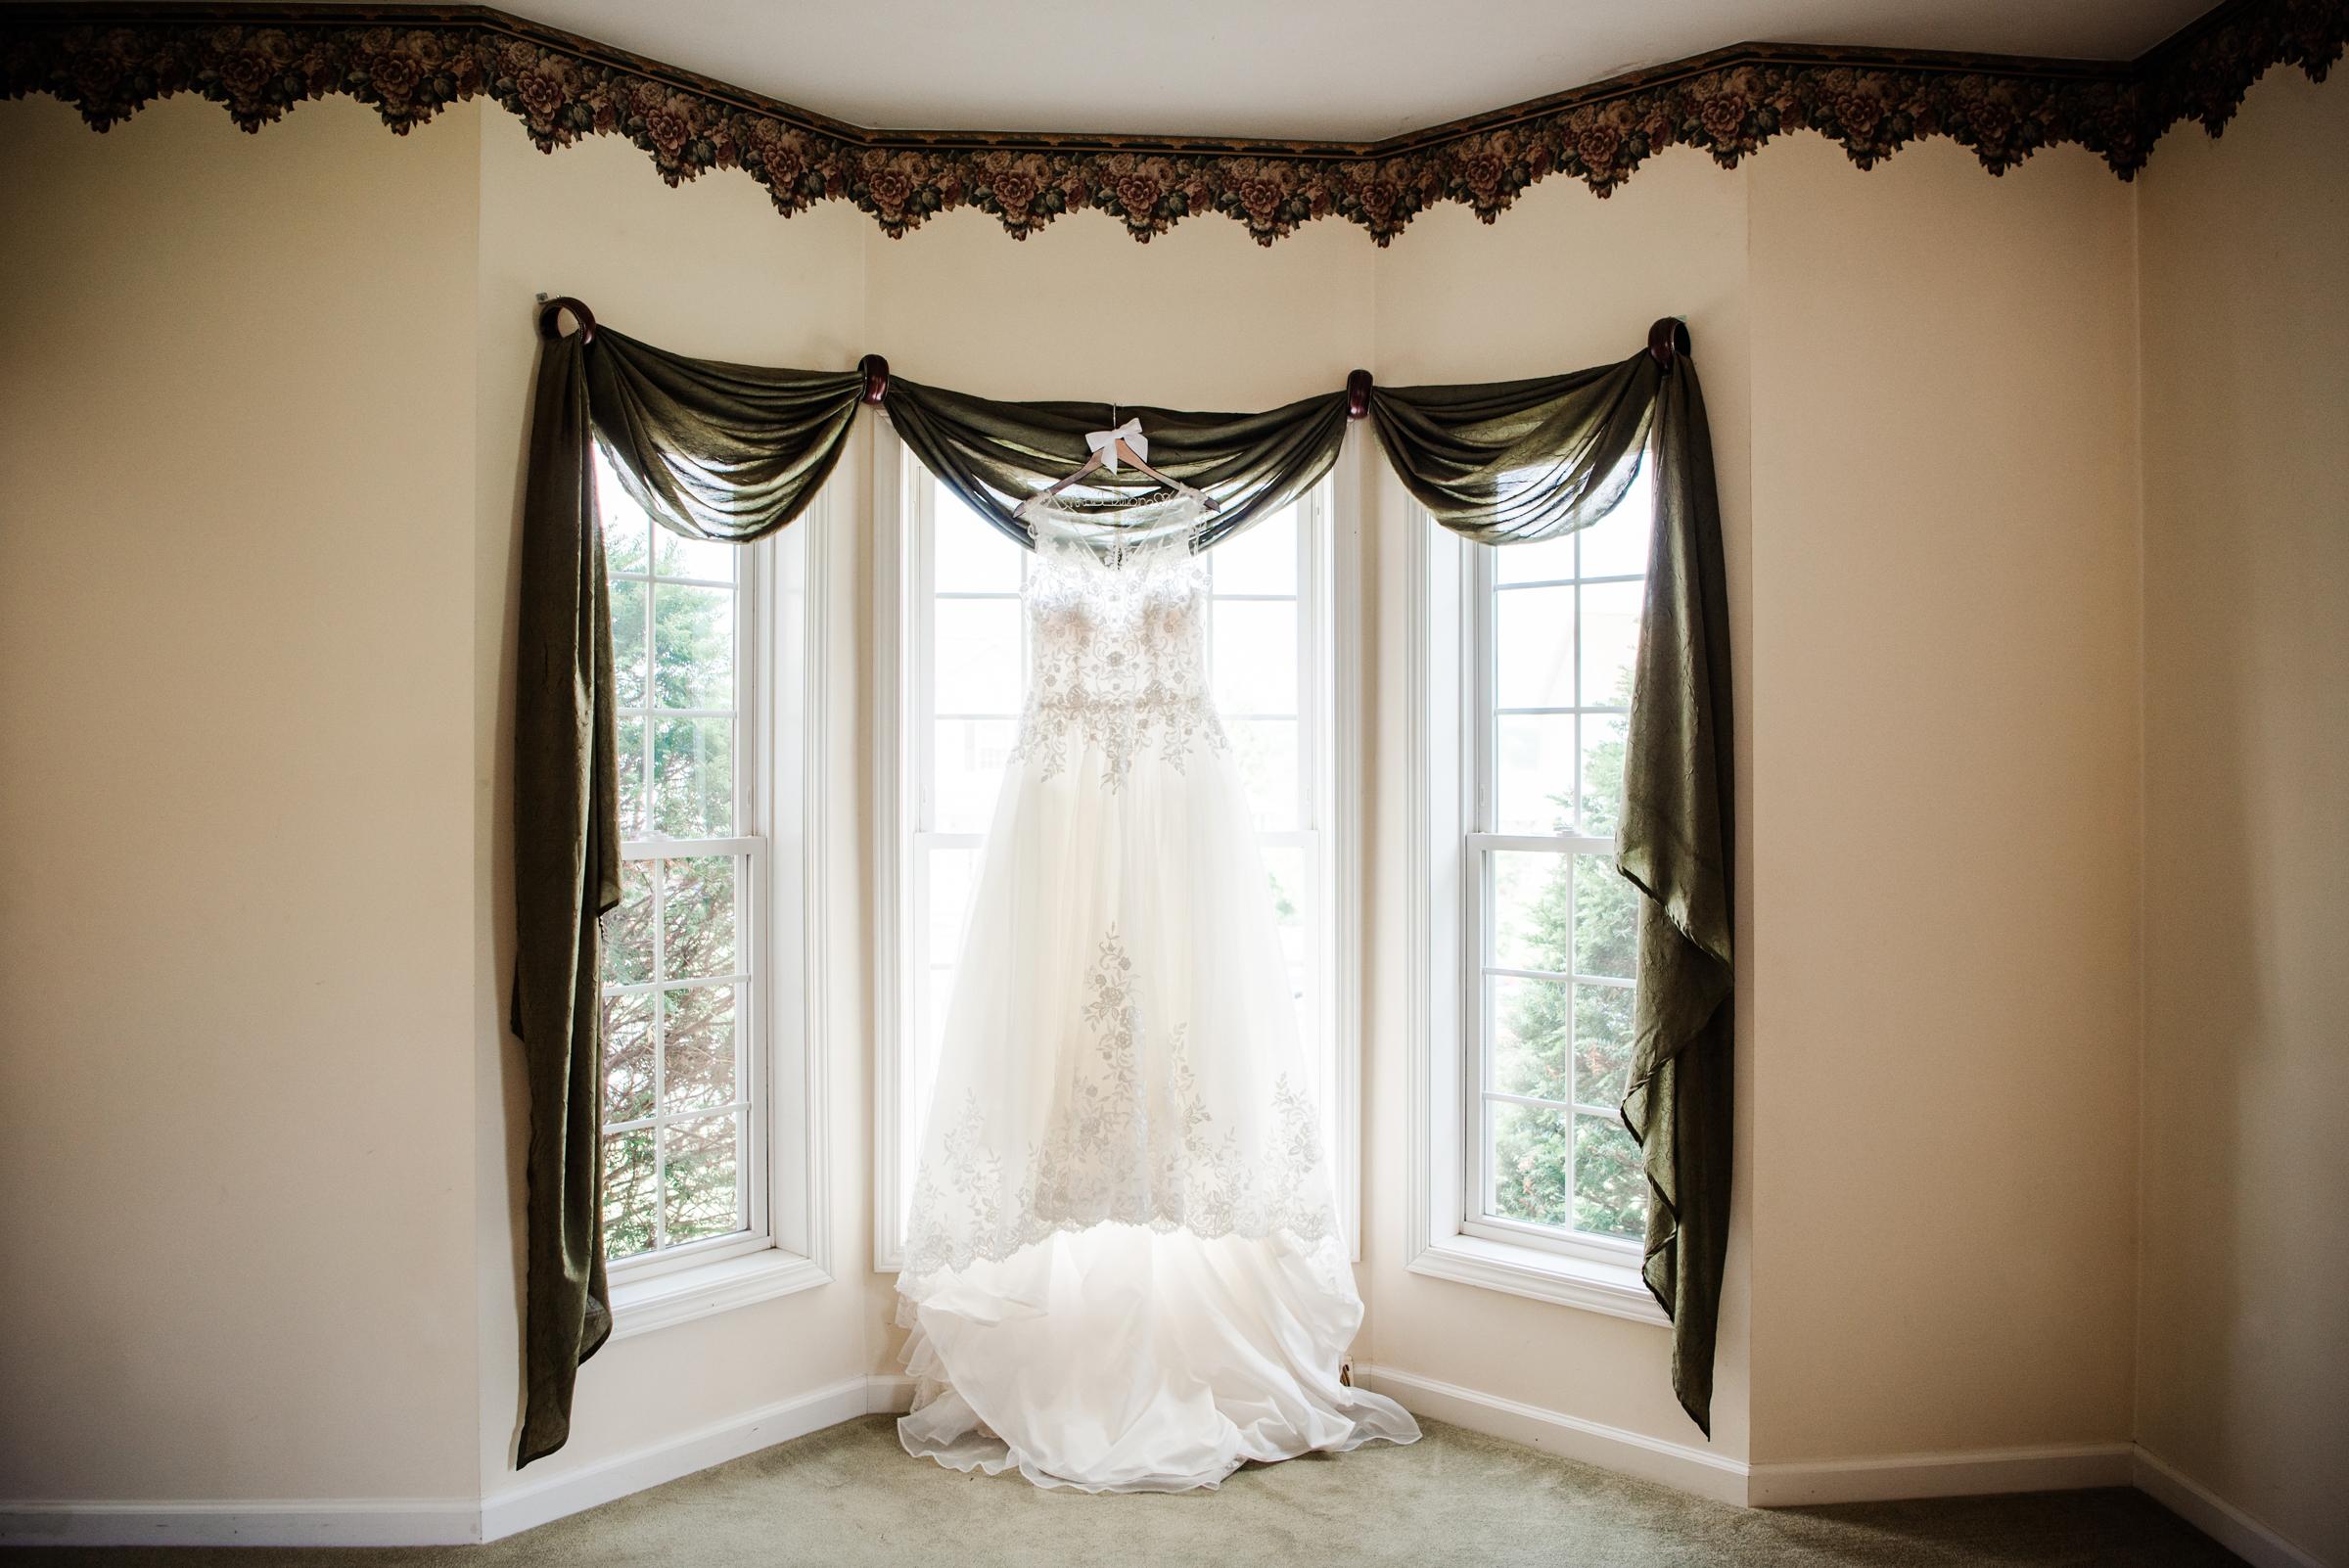 Historic_Old_St_Johns_Church_Valentinos_Banquet_Hall_Central_NY_Wedding_JILL_STUDIO_Rochester_NY_Photographer_DSC_5385.jpg